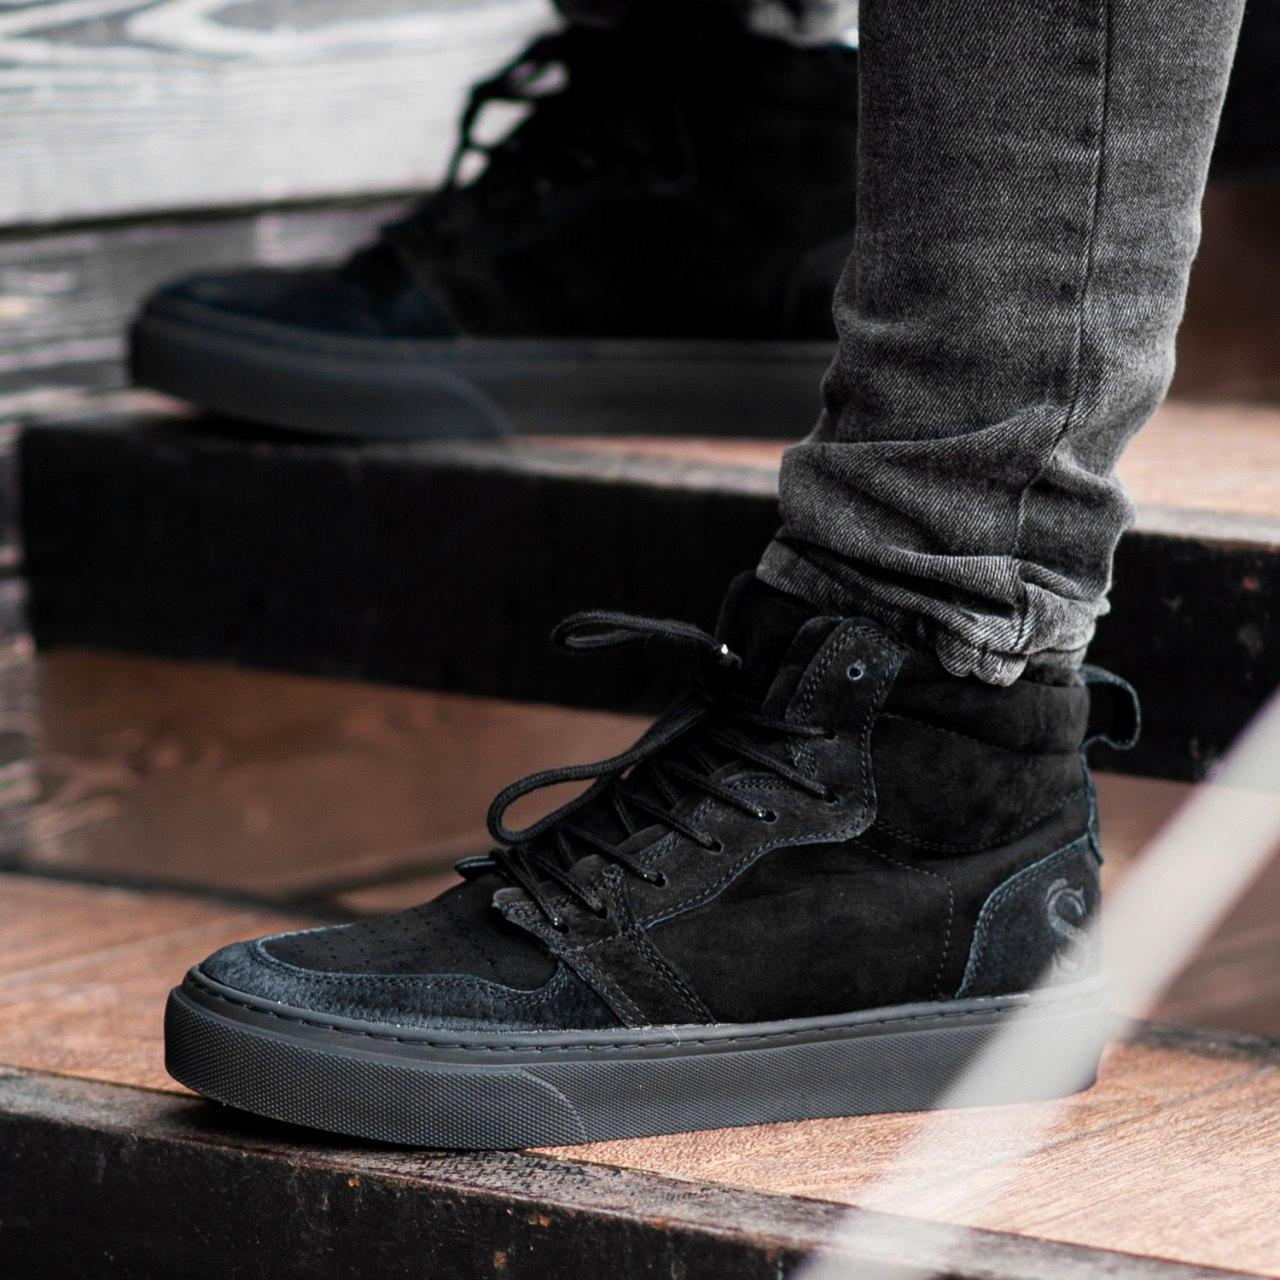 Ботинки South Ferro black - фото 1